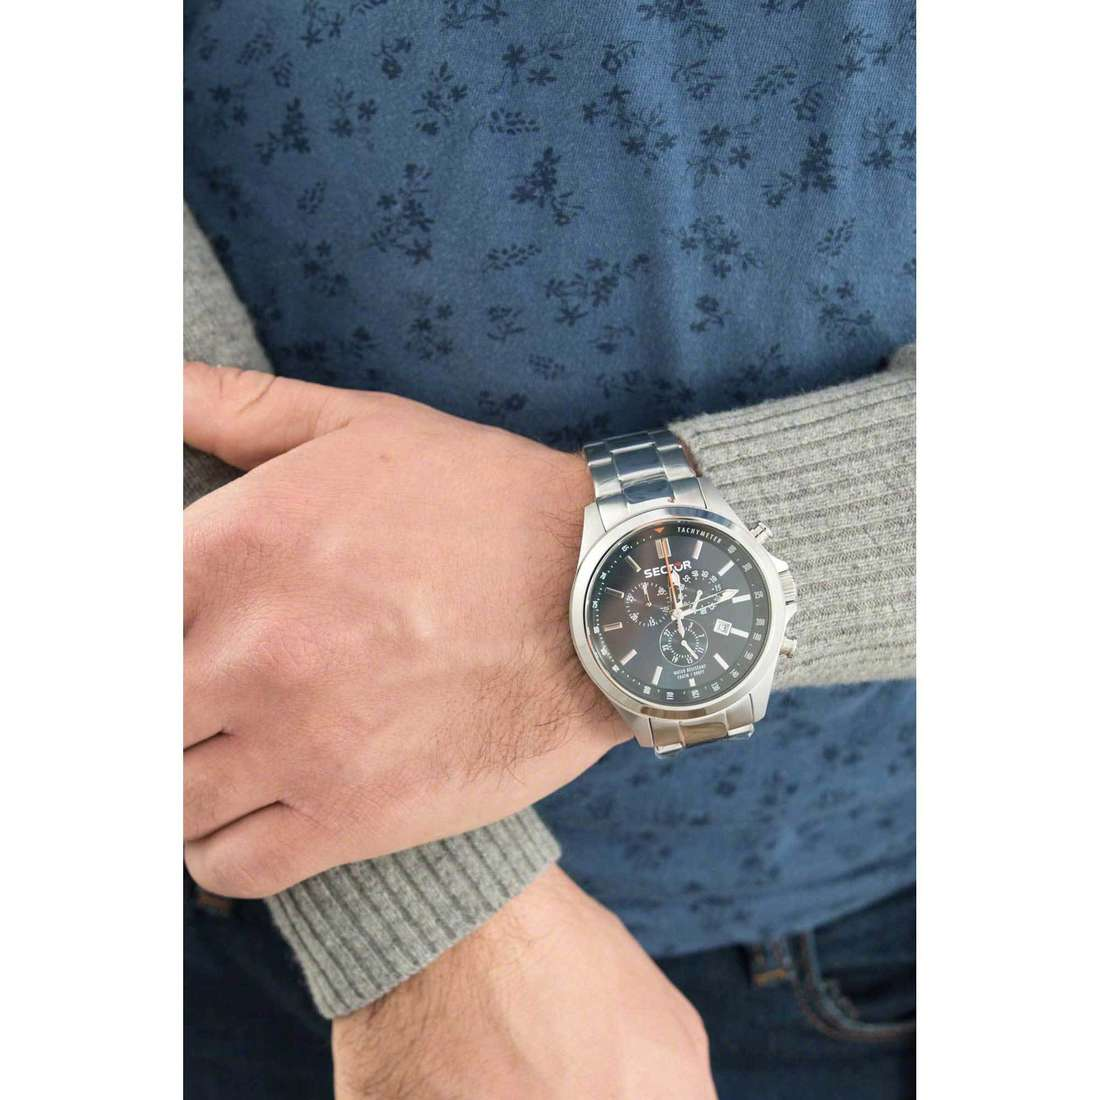 Sector cronografi 180 uomo R3273690009 indosso